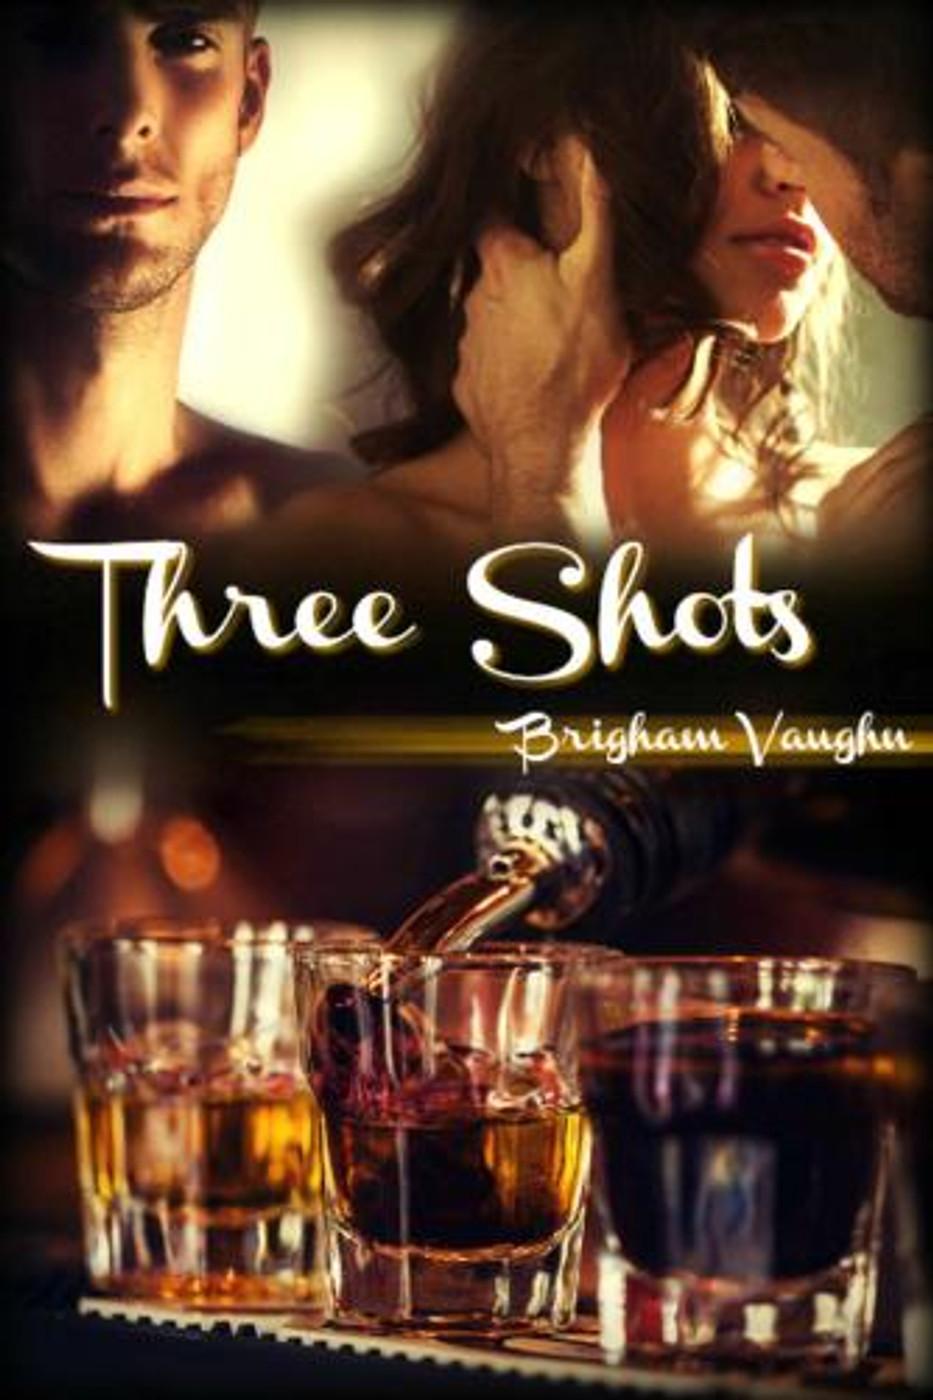 Three Shots - Brigham Vaughn.jpg